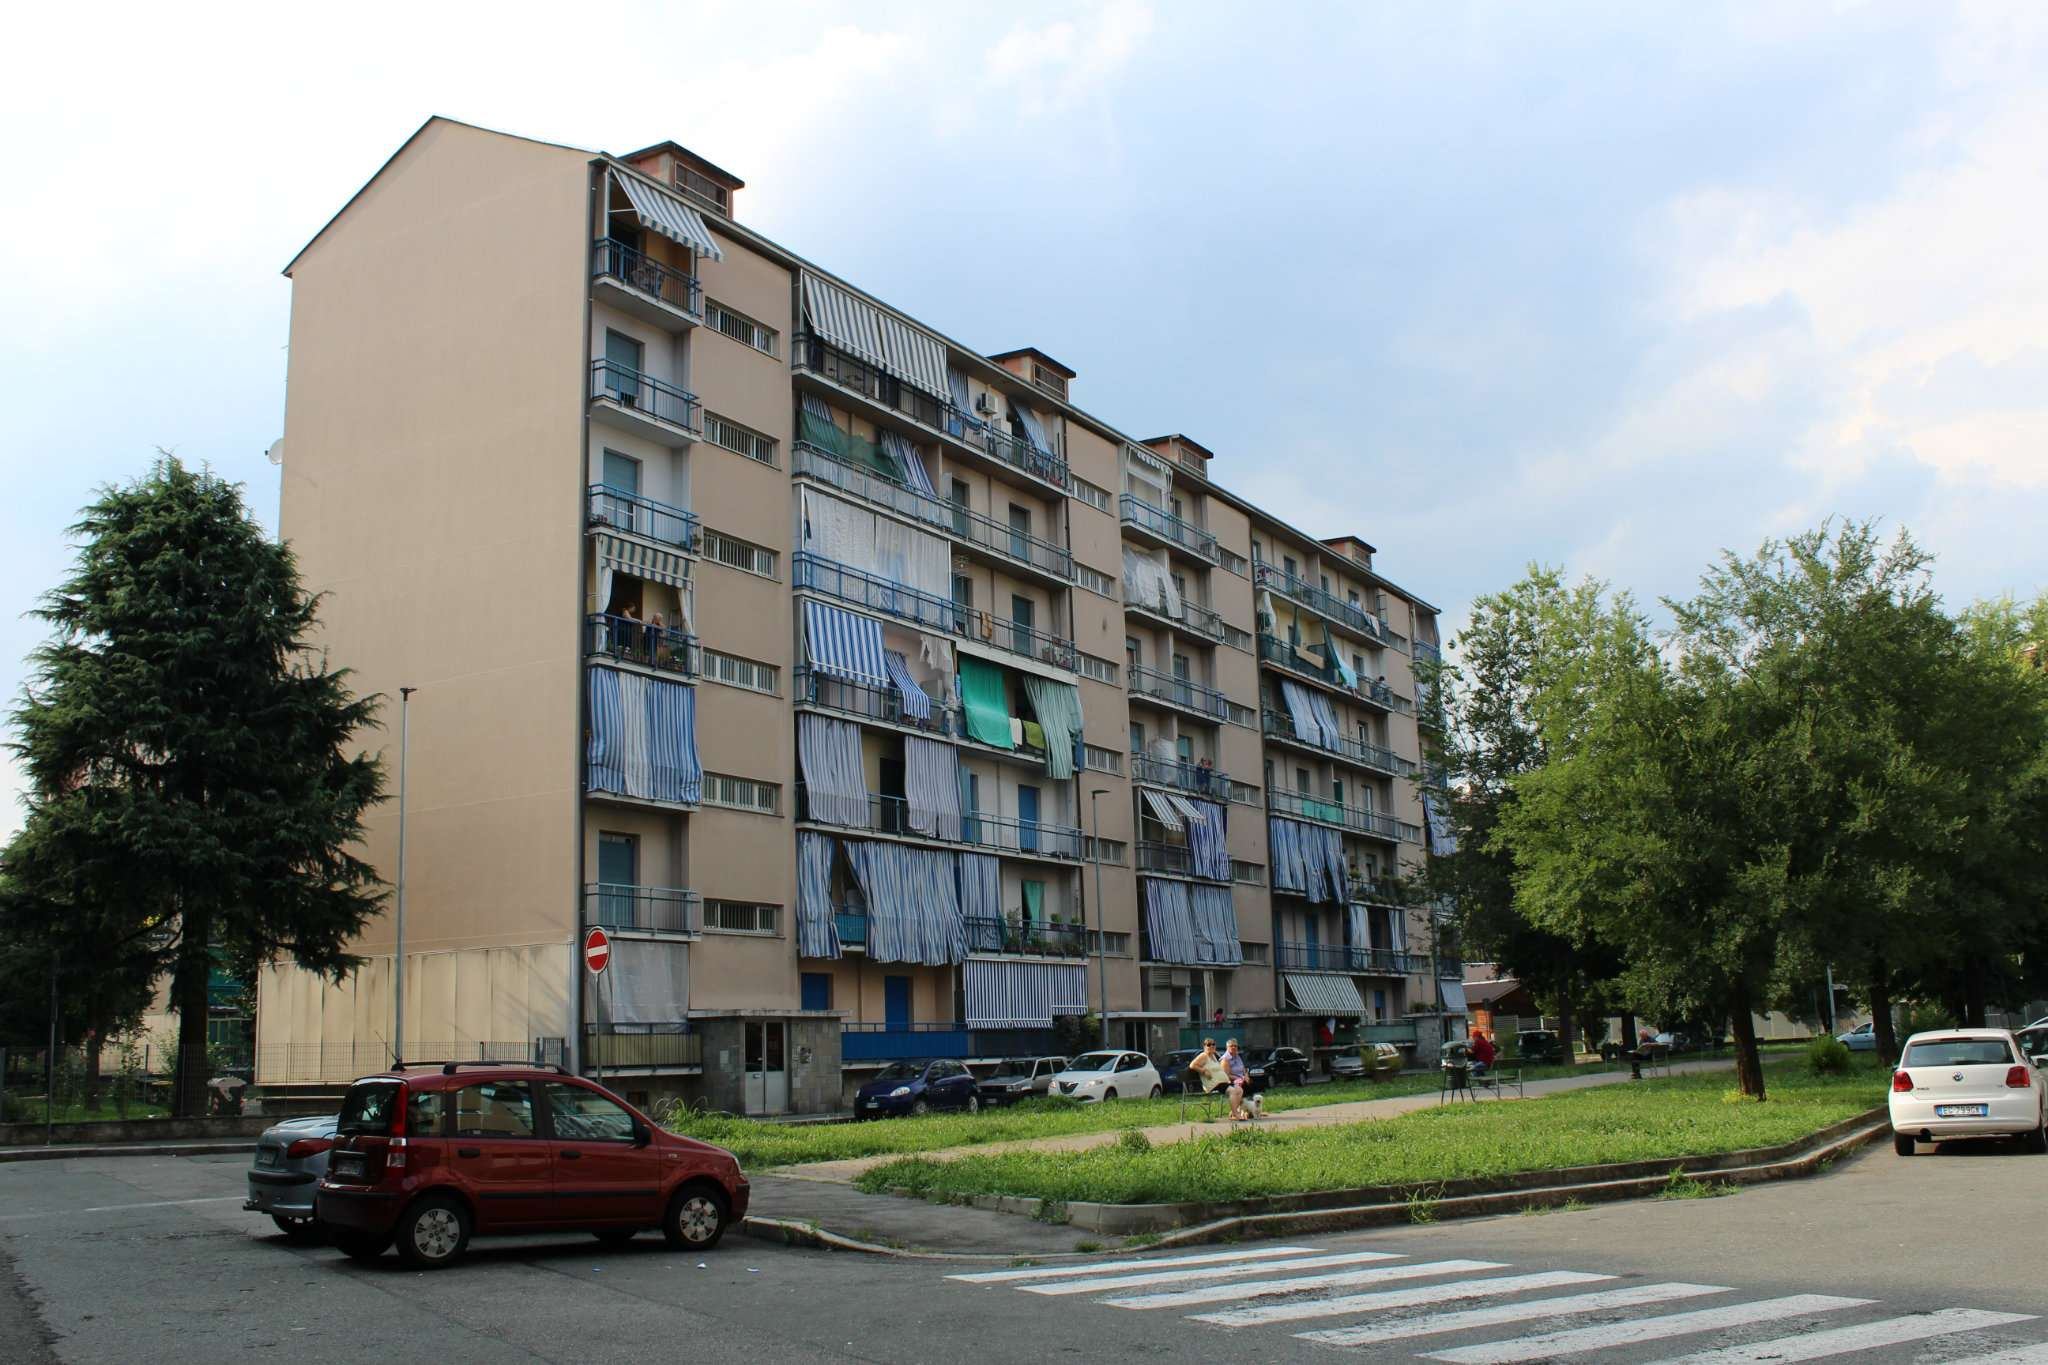 Bilocale Torino Via Pergolesi 12